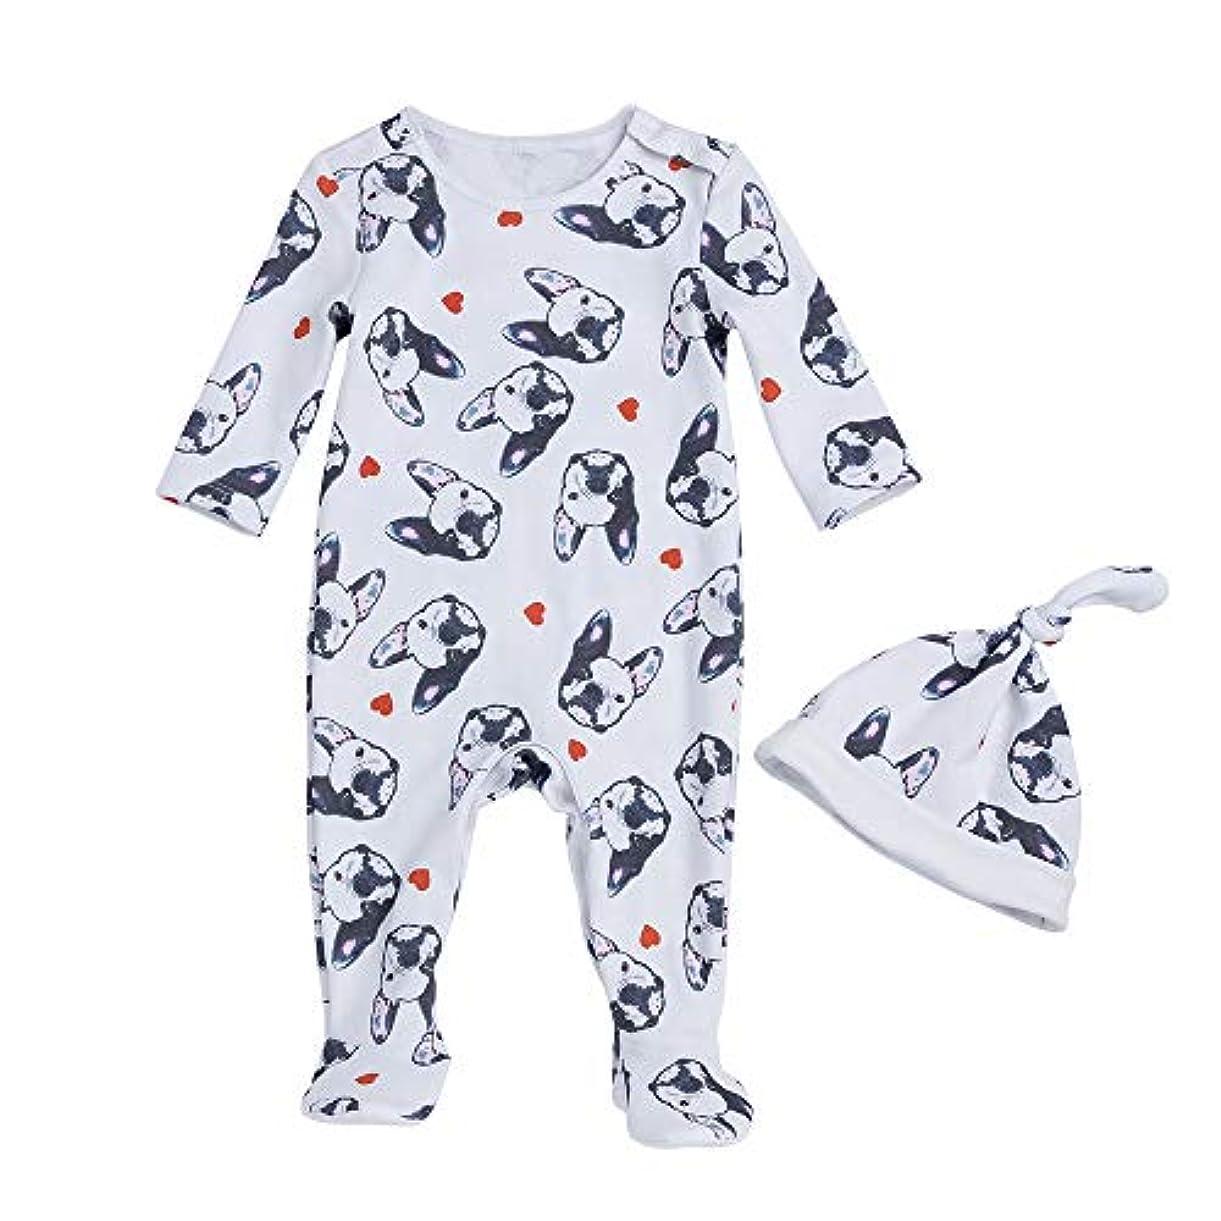 Liyukee - 赤ちゃん暖かいロンパー、帽子、ジャンプスーツの服下着セット秋の服ホームコスチューム0-24ヶ月に適して新生児の幼児少女 (3-6m)